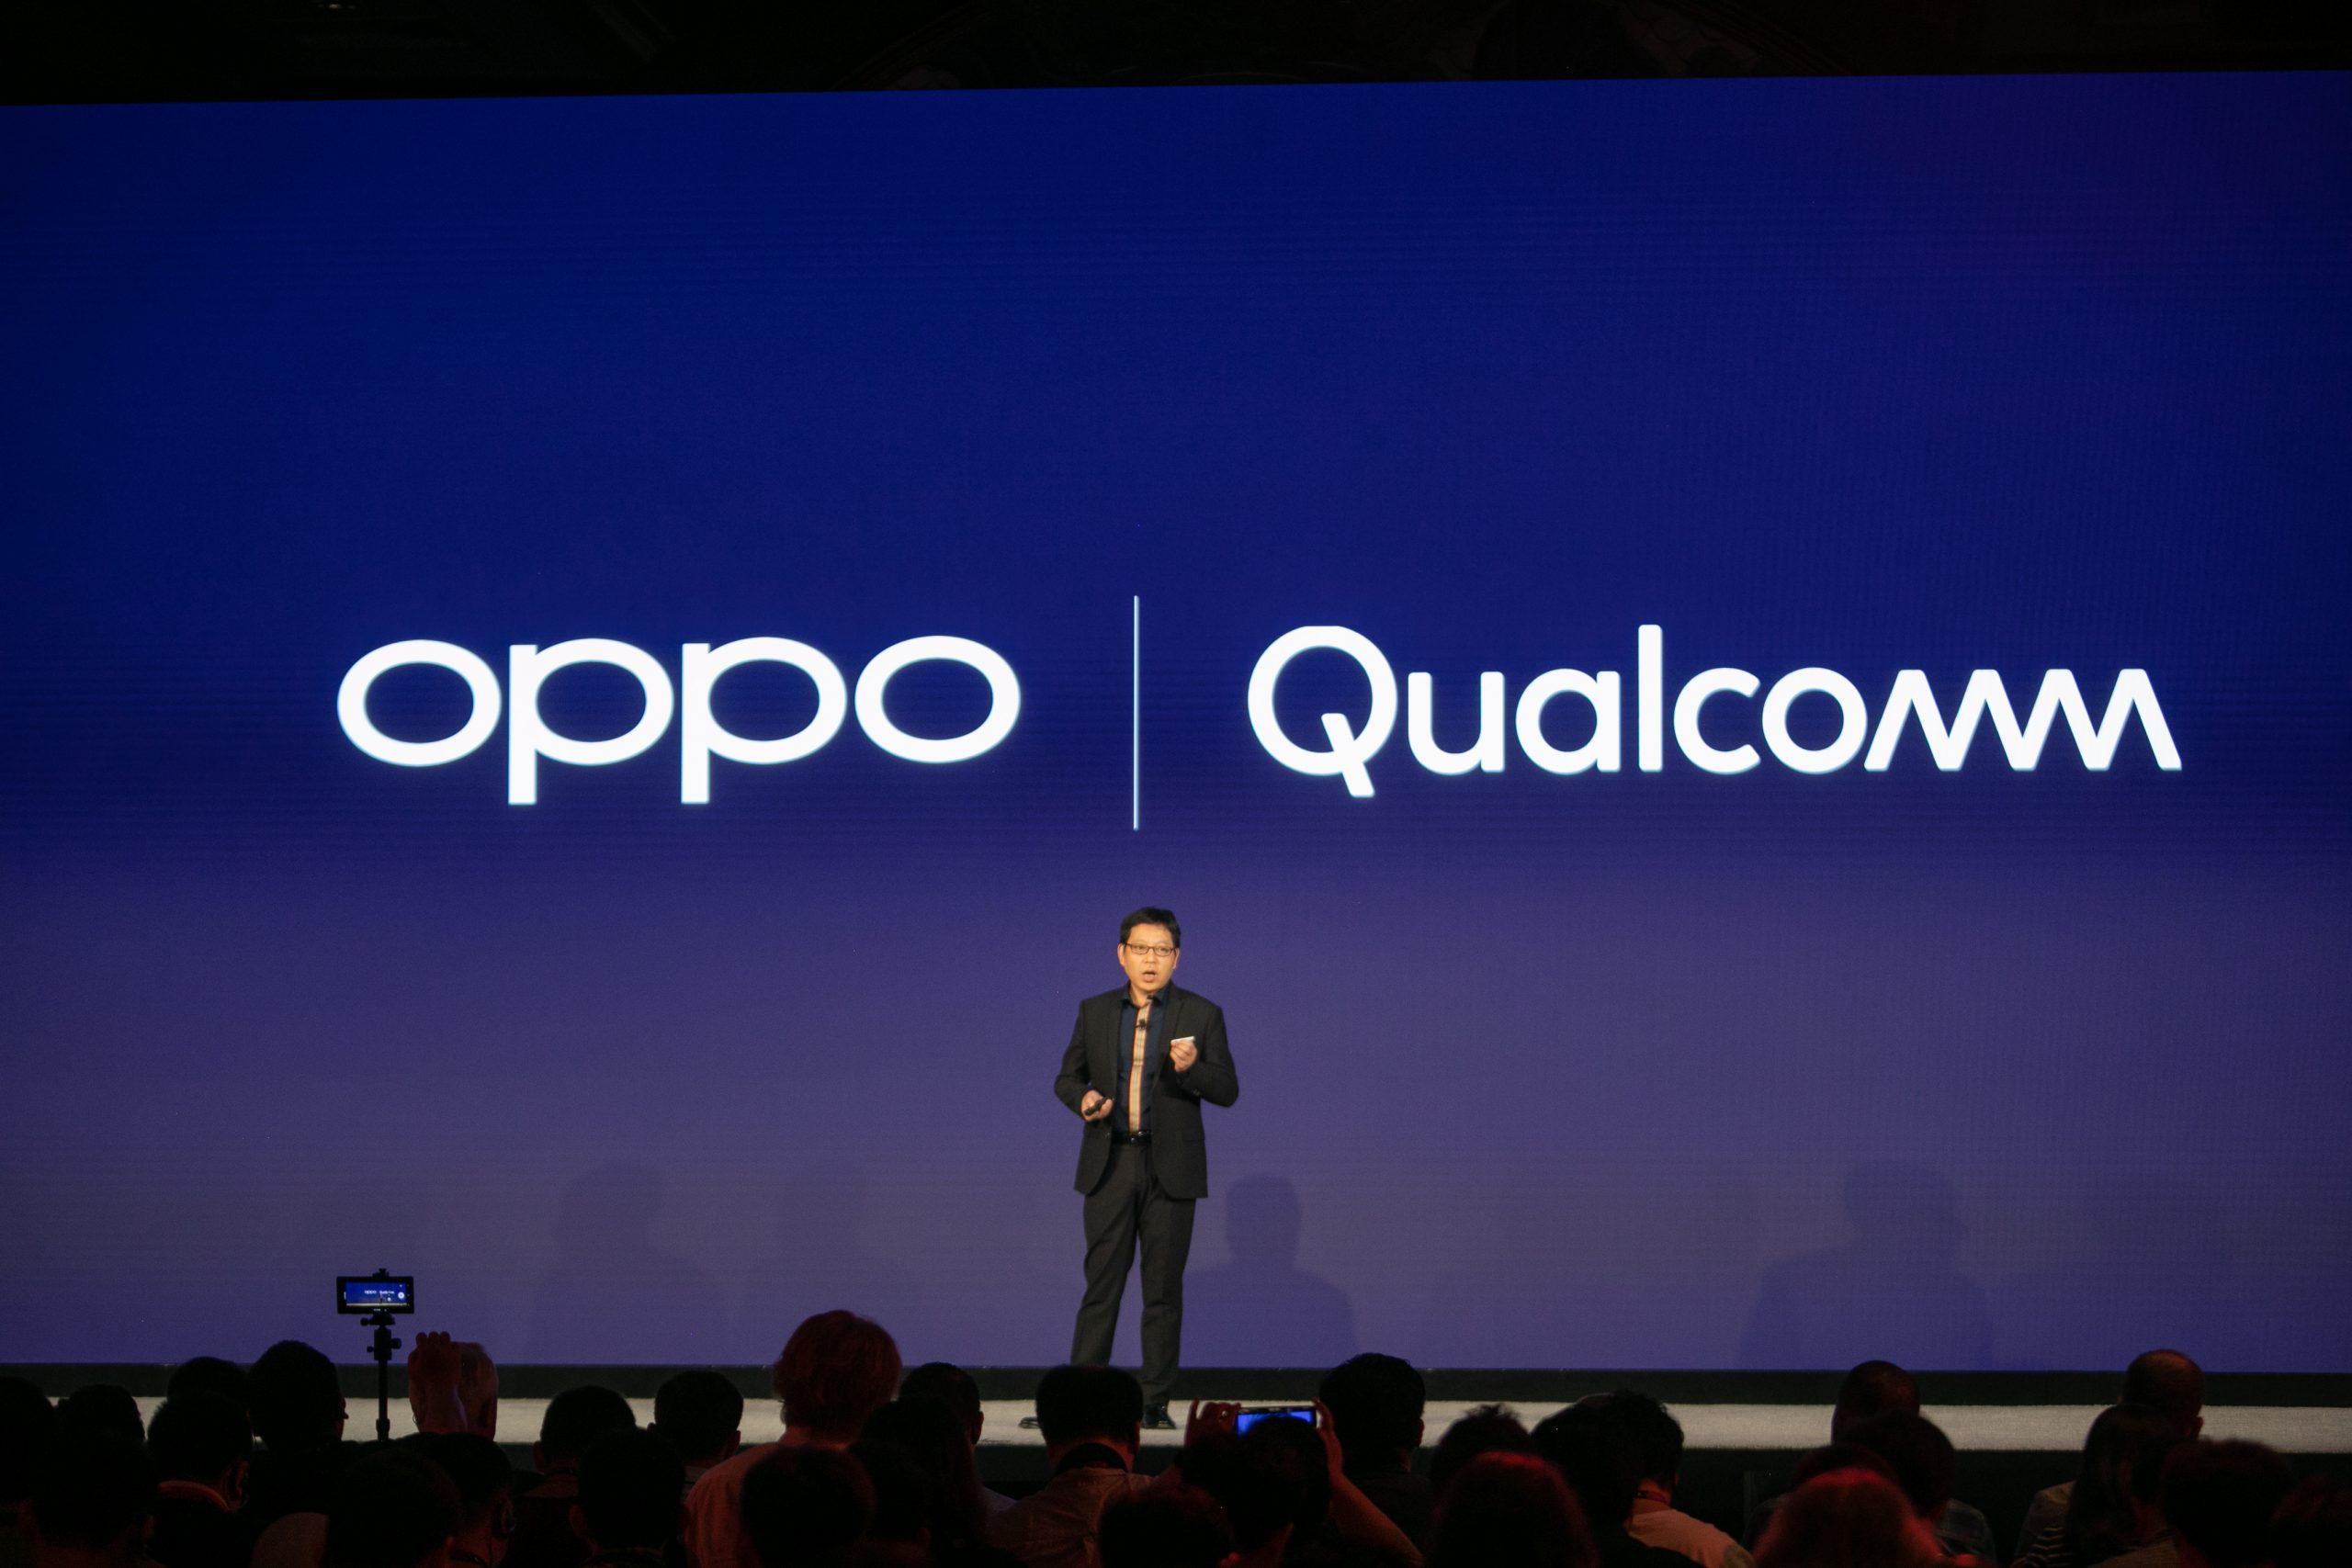 Oppo 5G - TechJuice